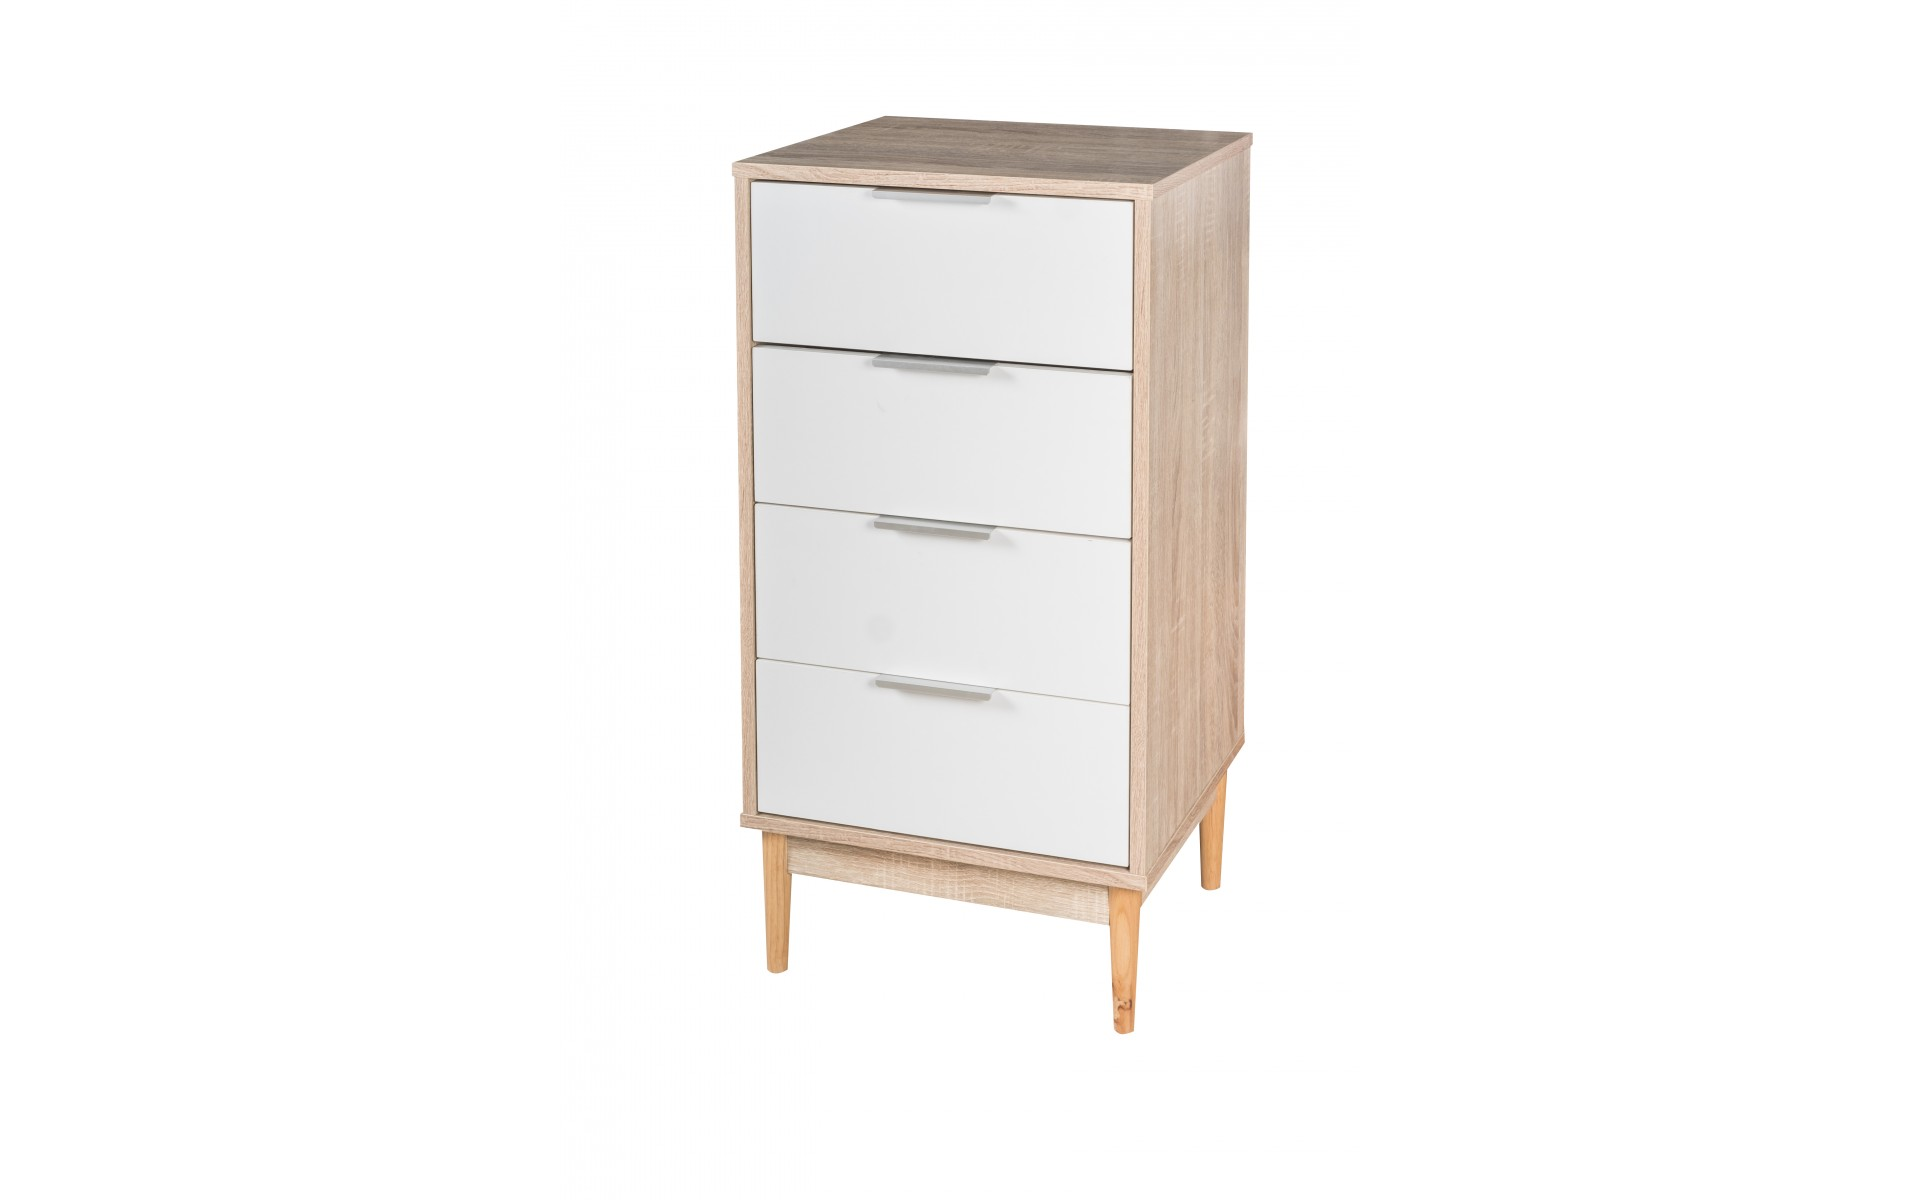 chiffonnier salle de bain simple top coiffeuse meuble fly avec chiffonnier noir conforama. Black Bedroom Furniture Sets. Home Design Ideas